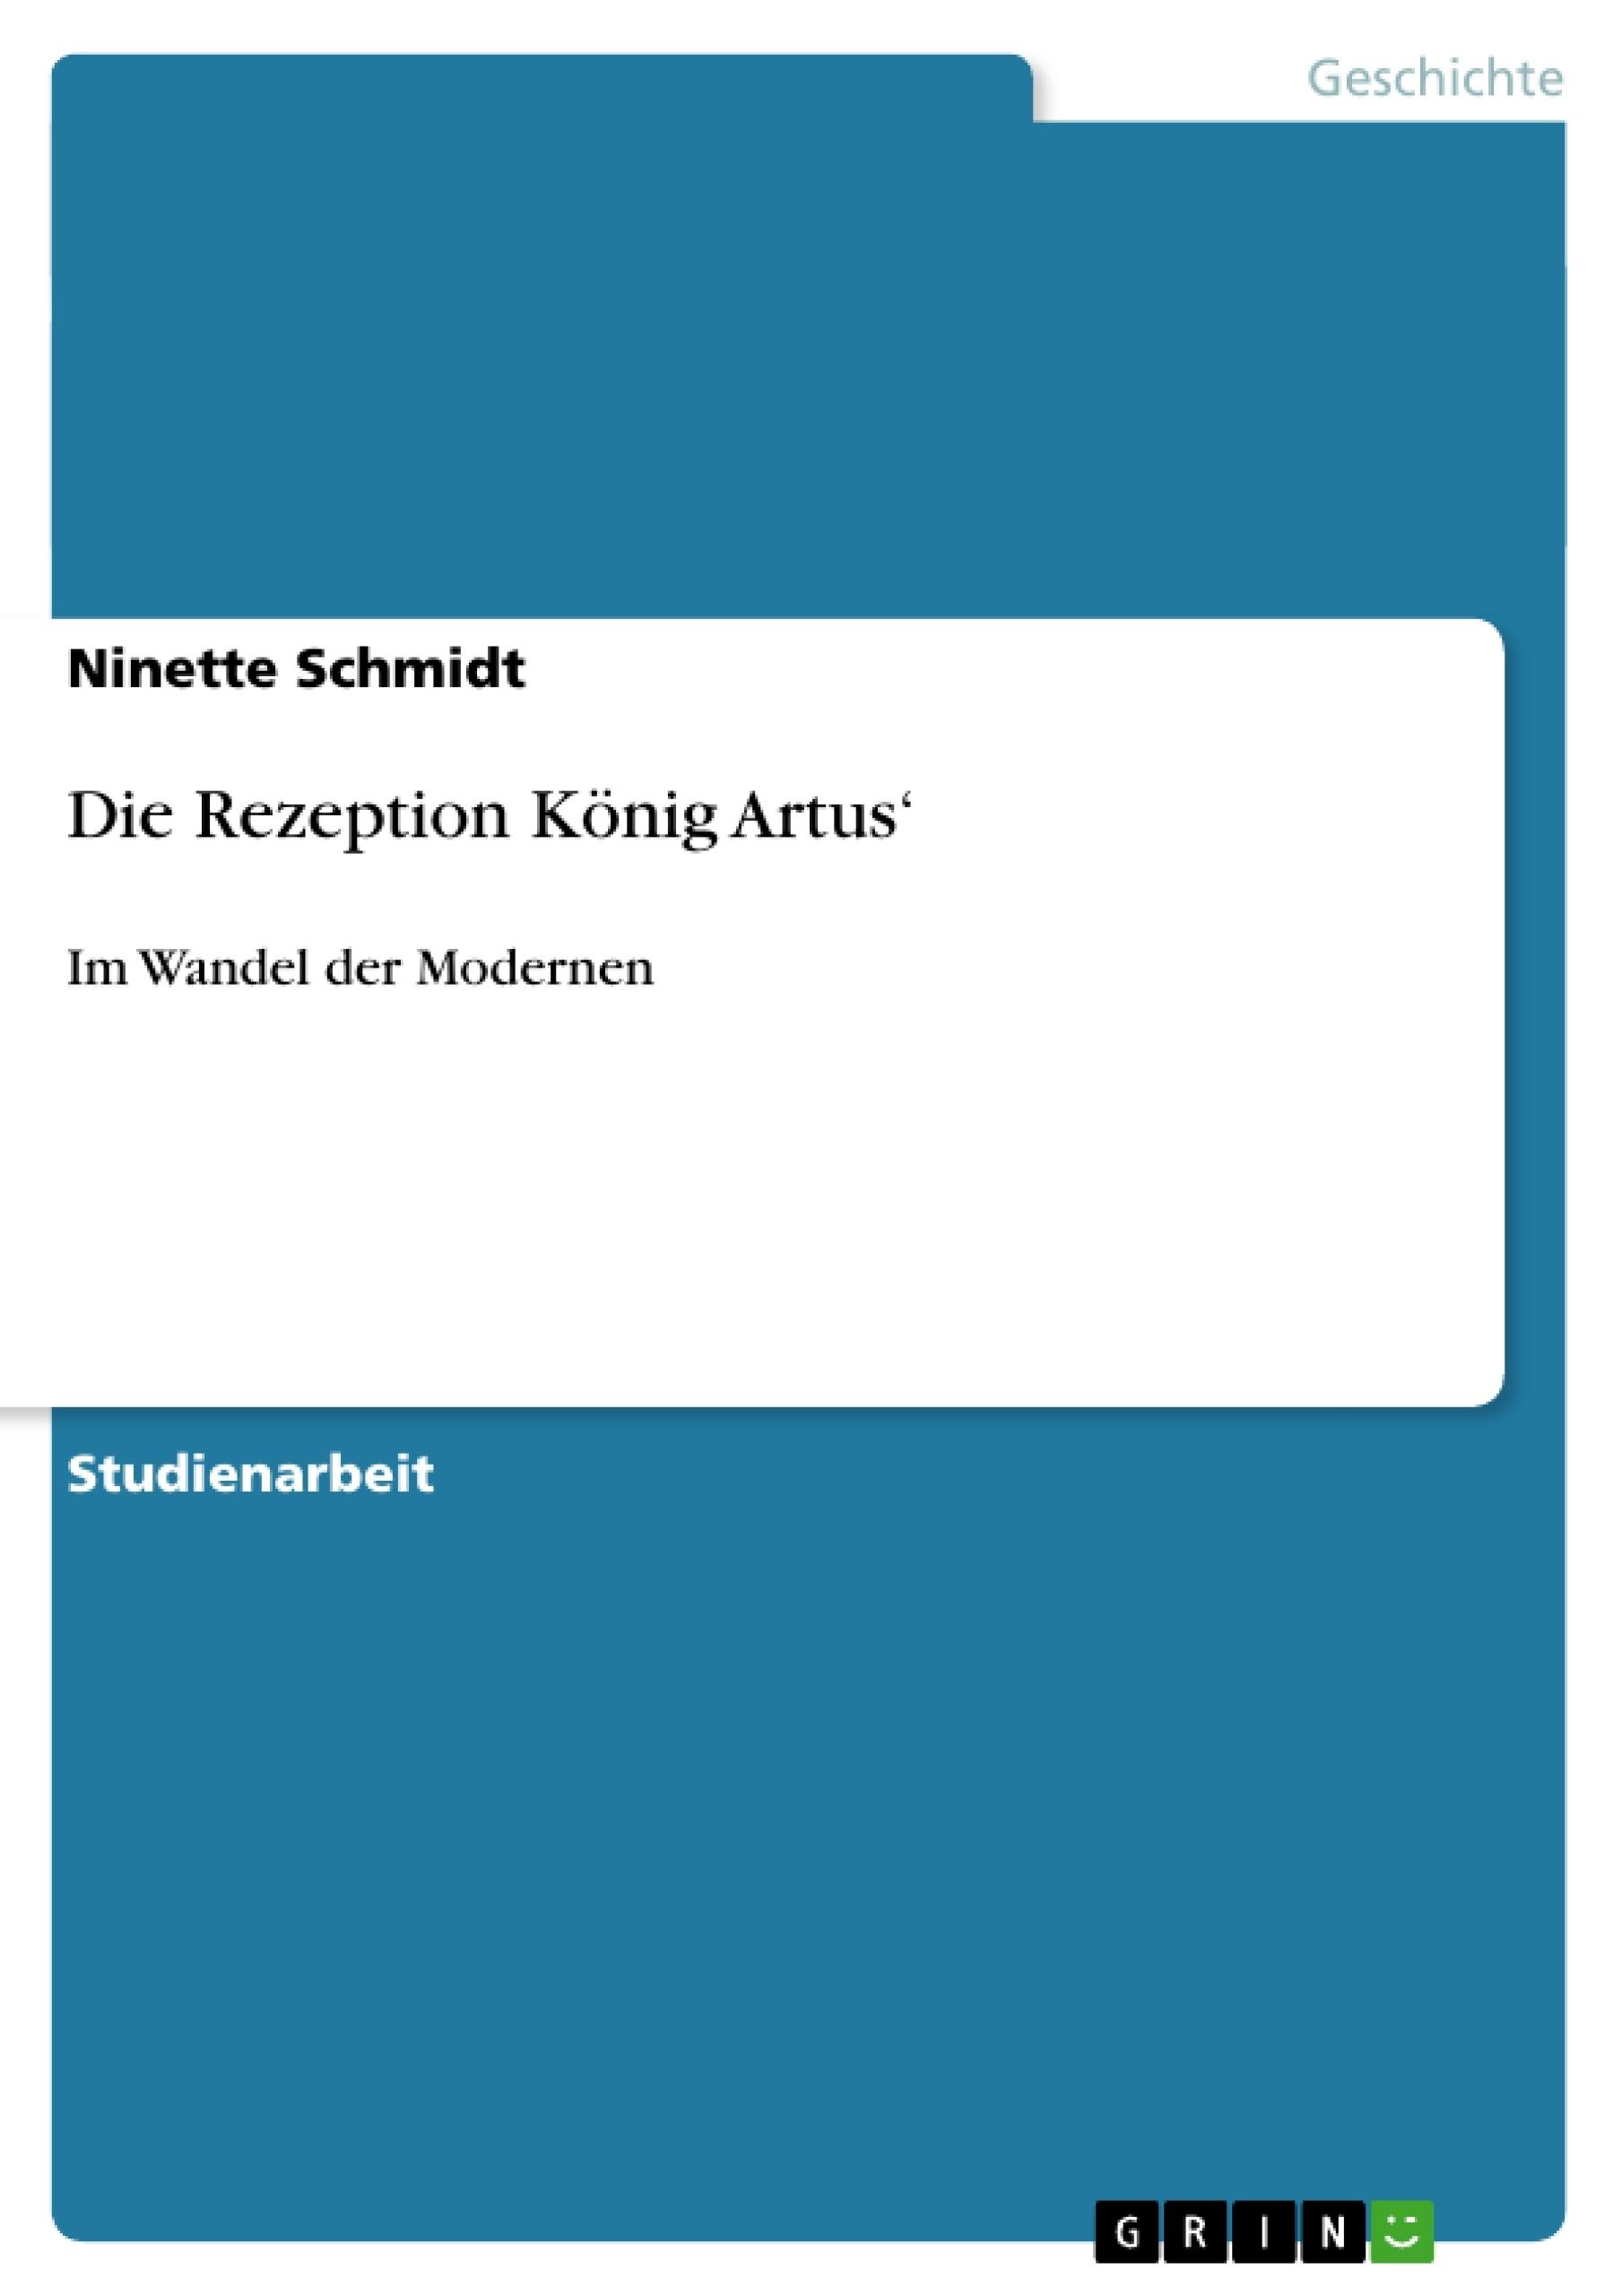 Titel: Die Rezeption König Artus'